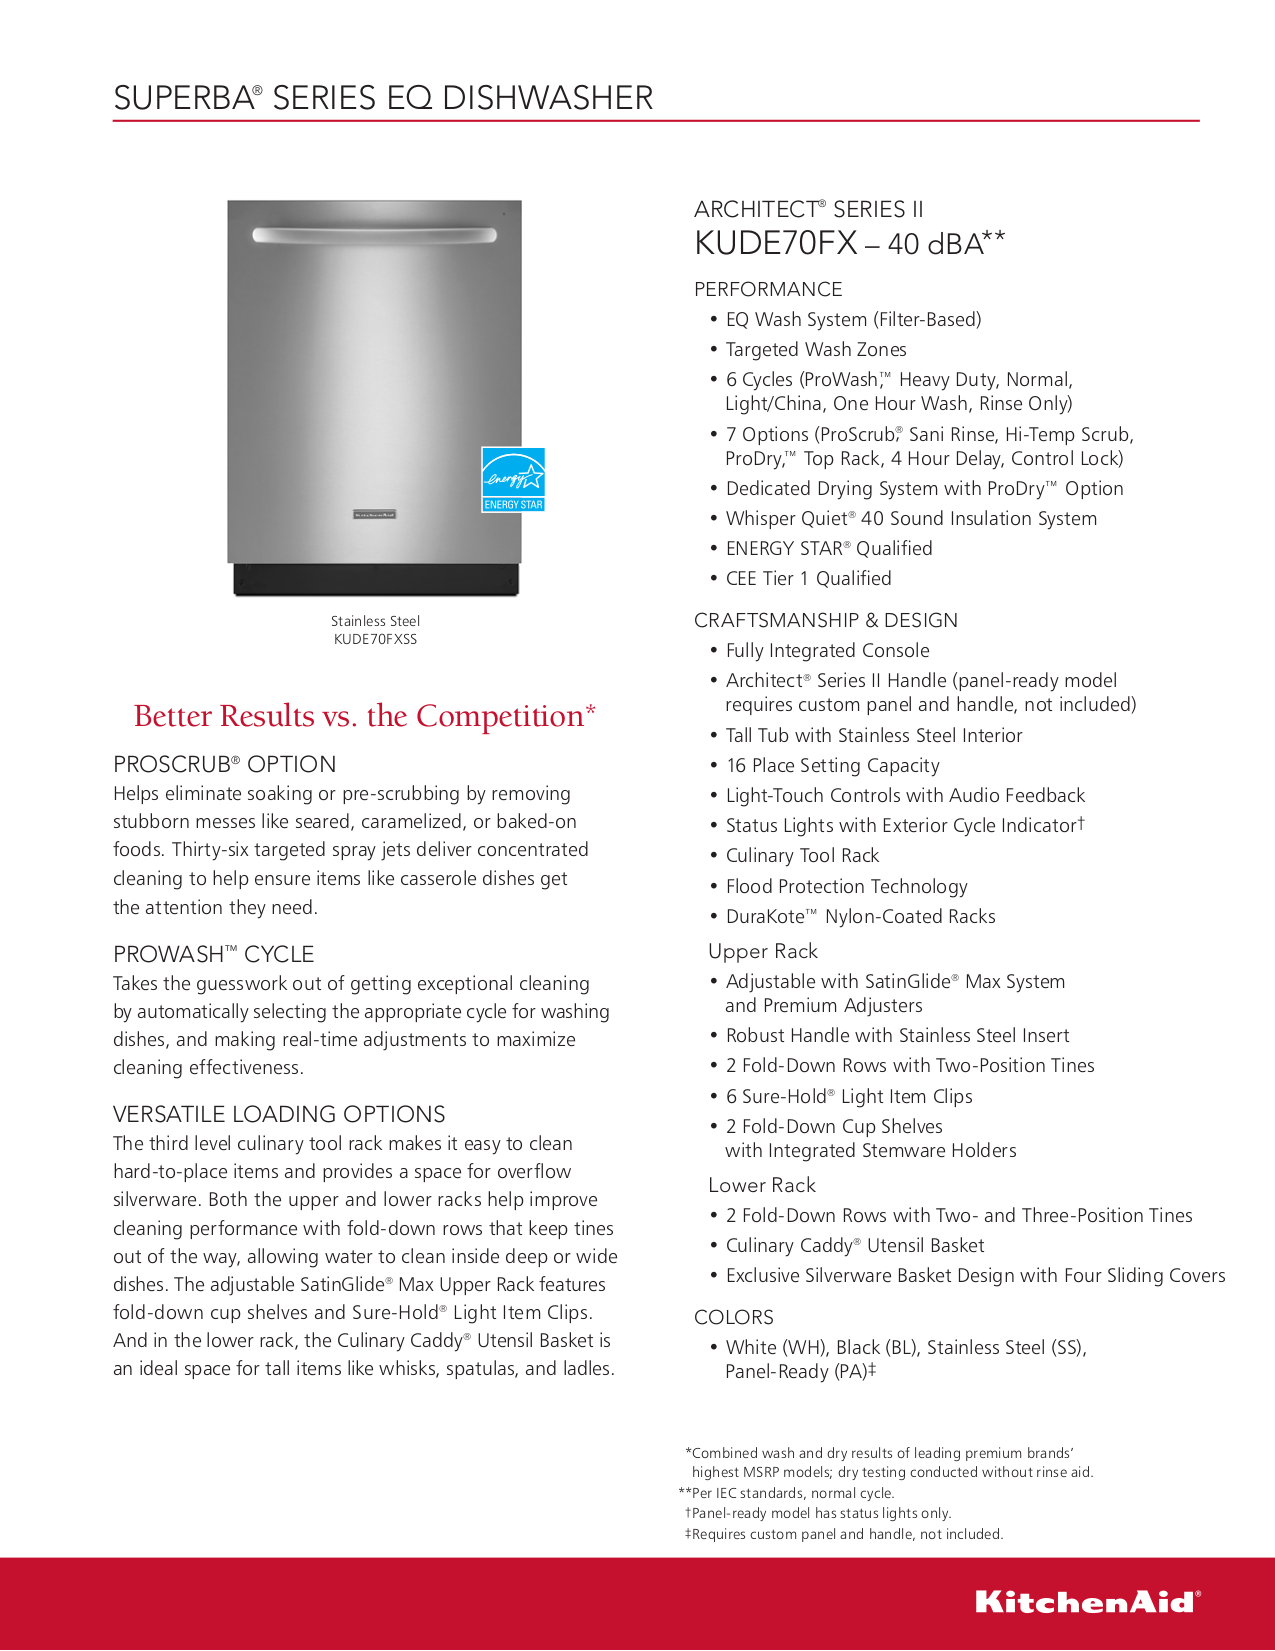 Pdf For Kitchenaid Dishwasher Superba Kude70fxss Manual